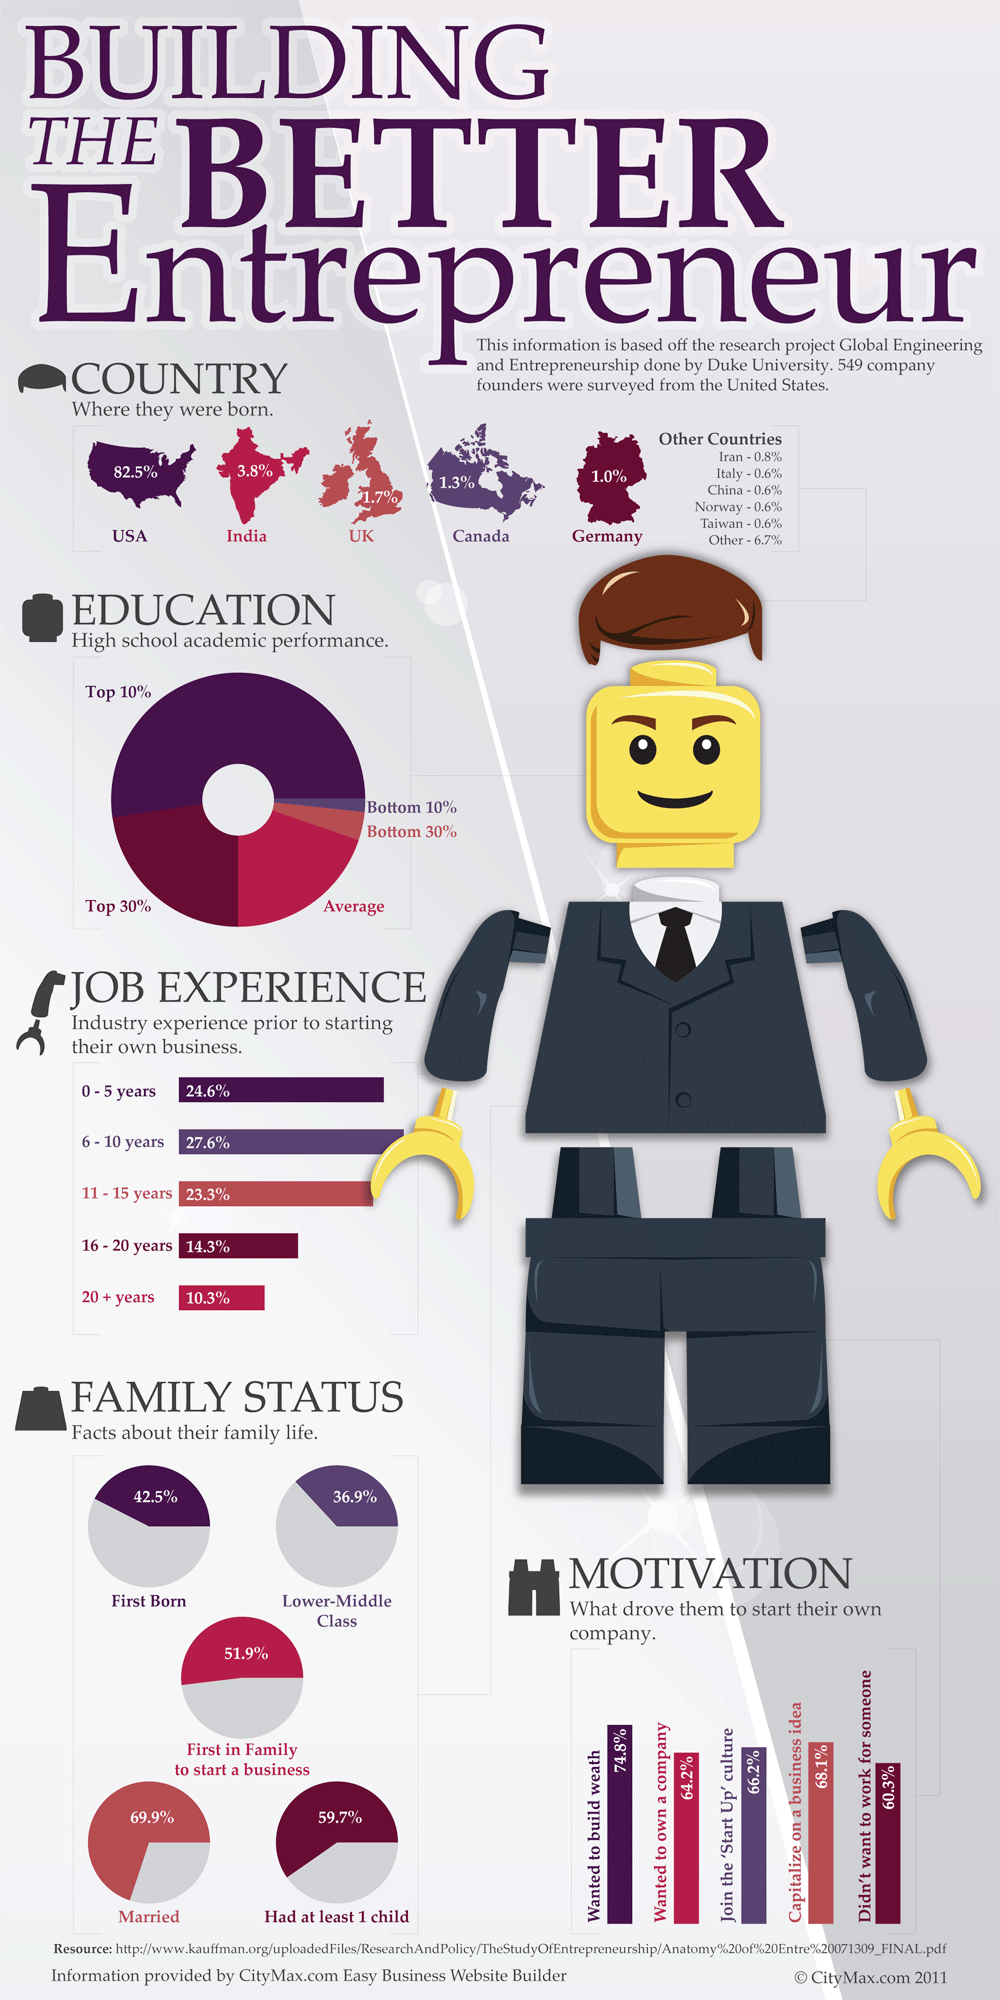 Assignment Two: Entrepreneur Case Study